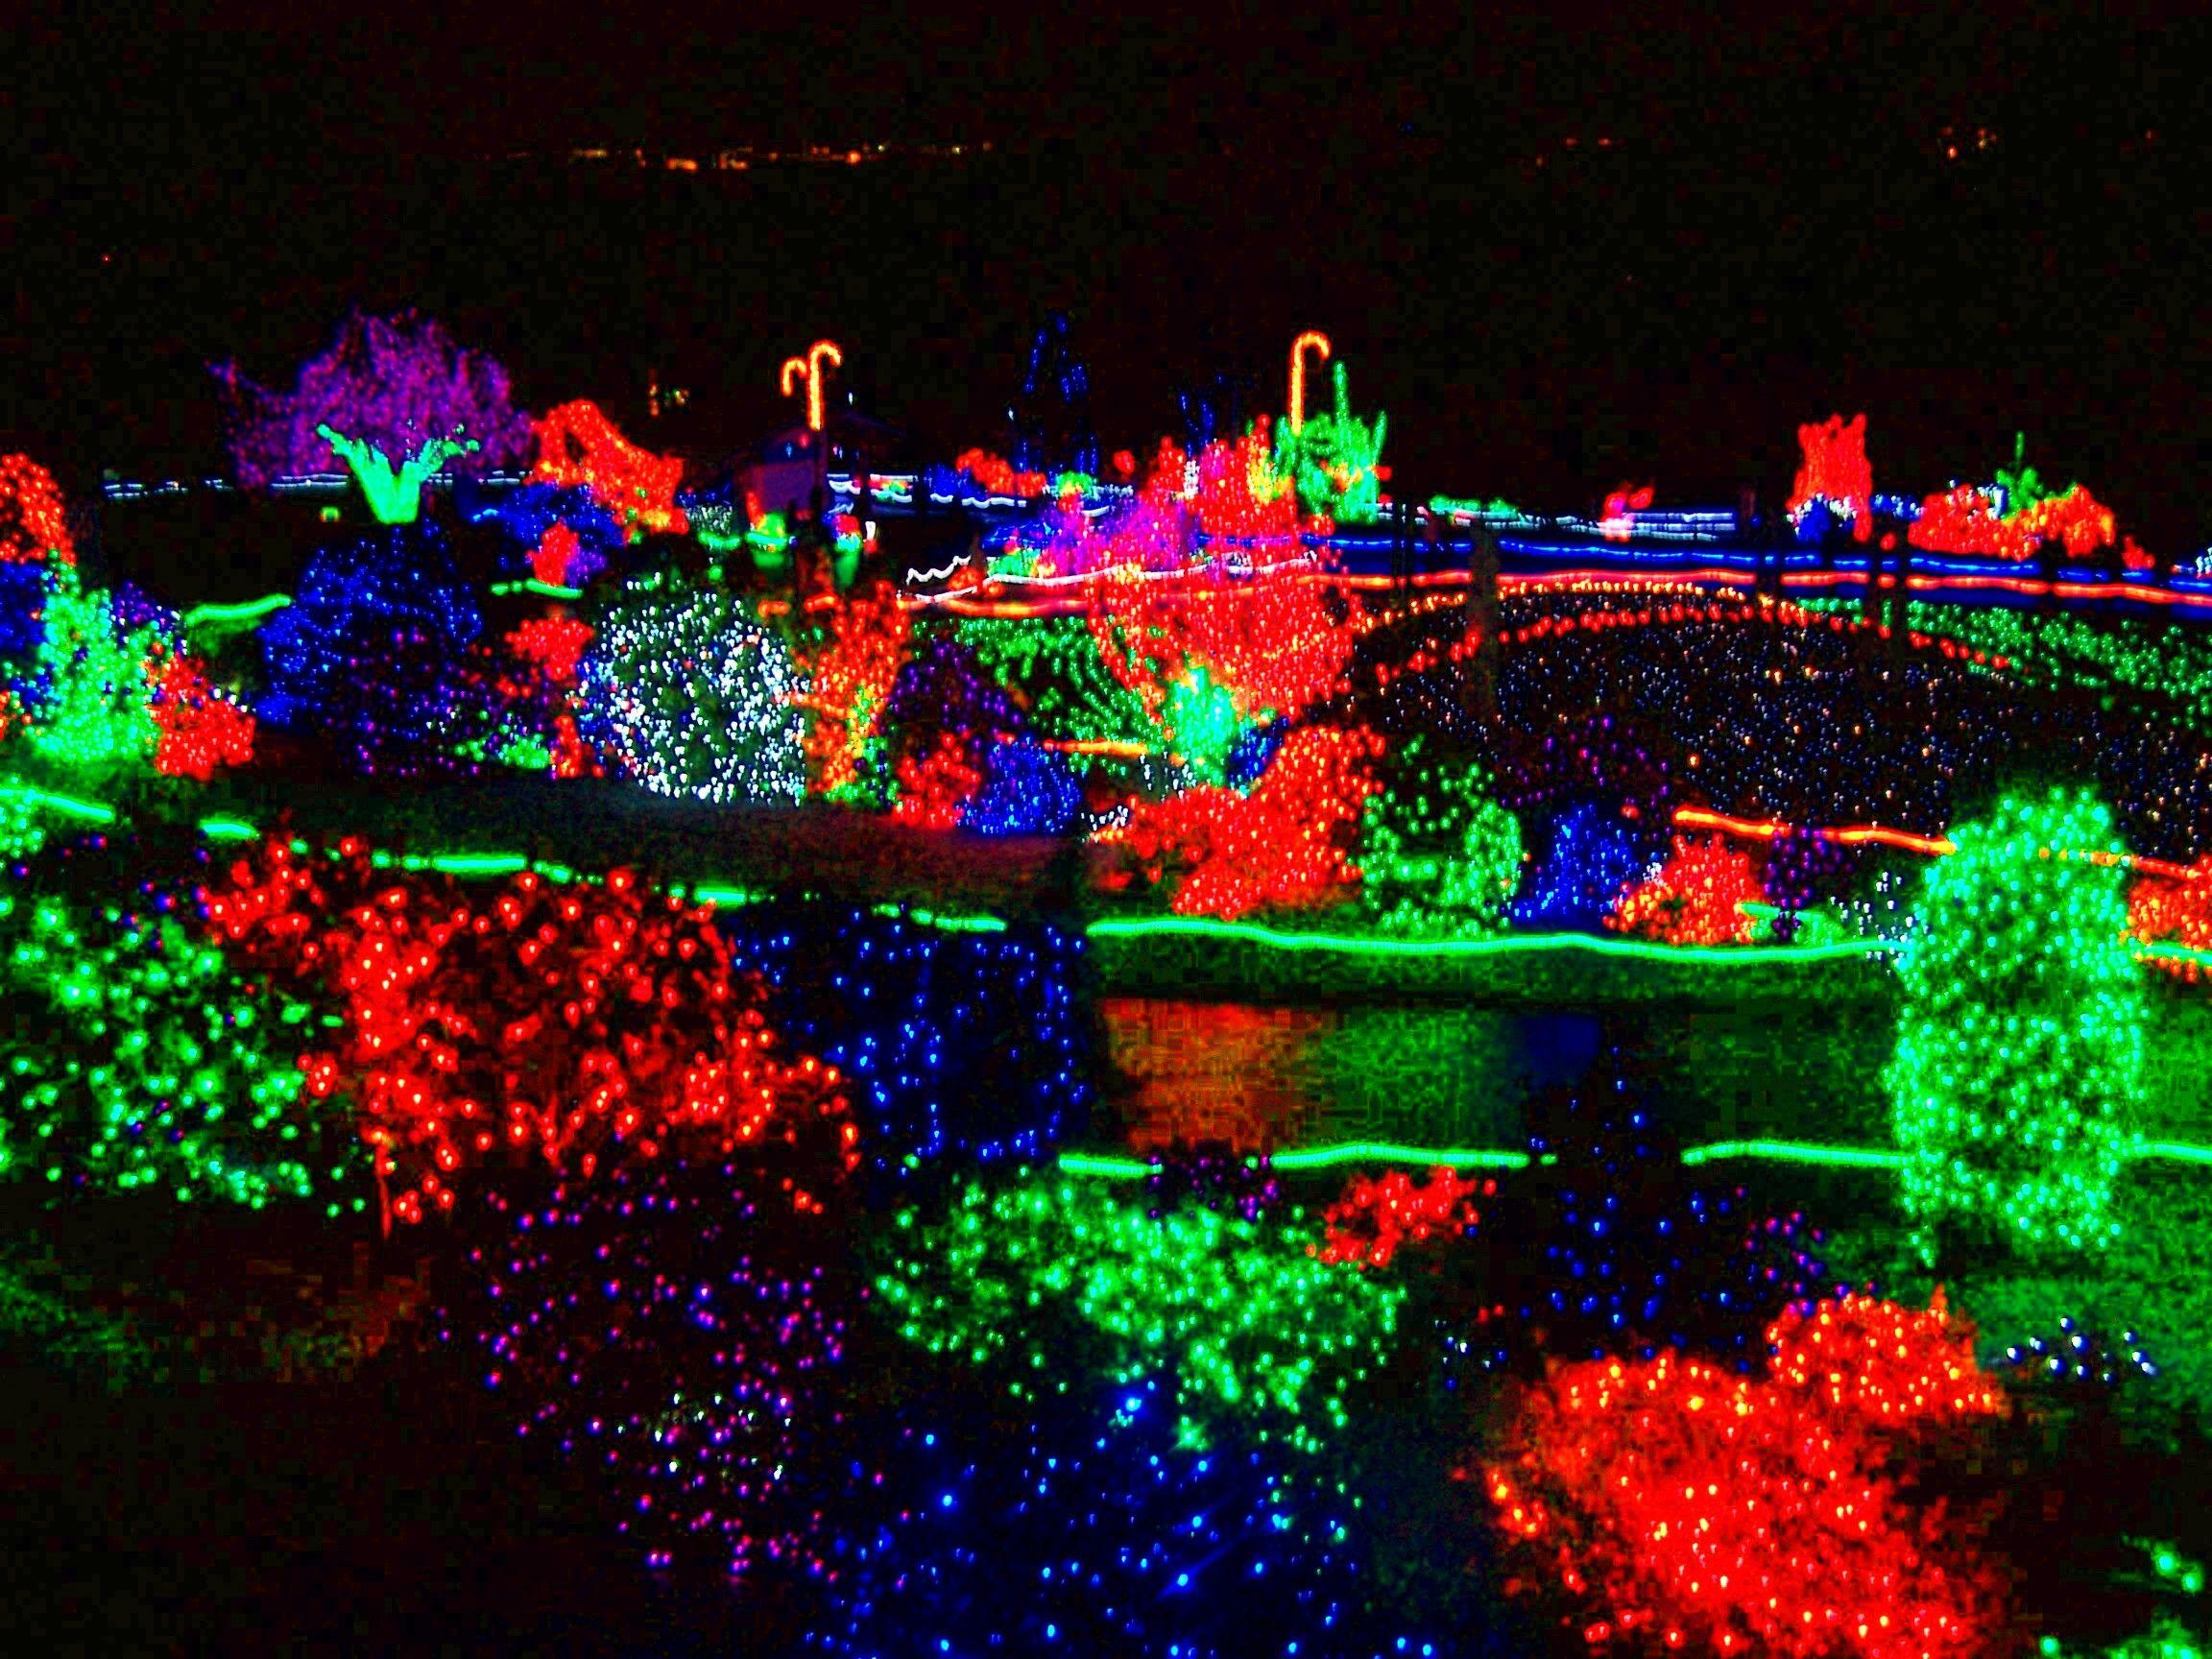 Tacoma Wa Pt Defiance Zoo Lights Celebration Zoo Lights Anniversary Trips Woodland Park Zoo